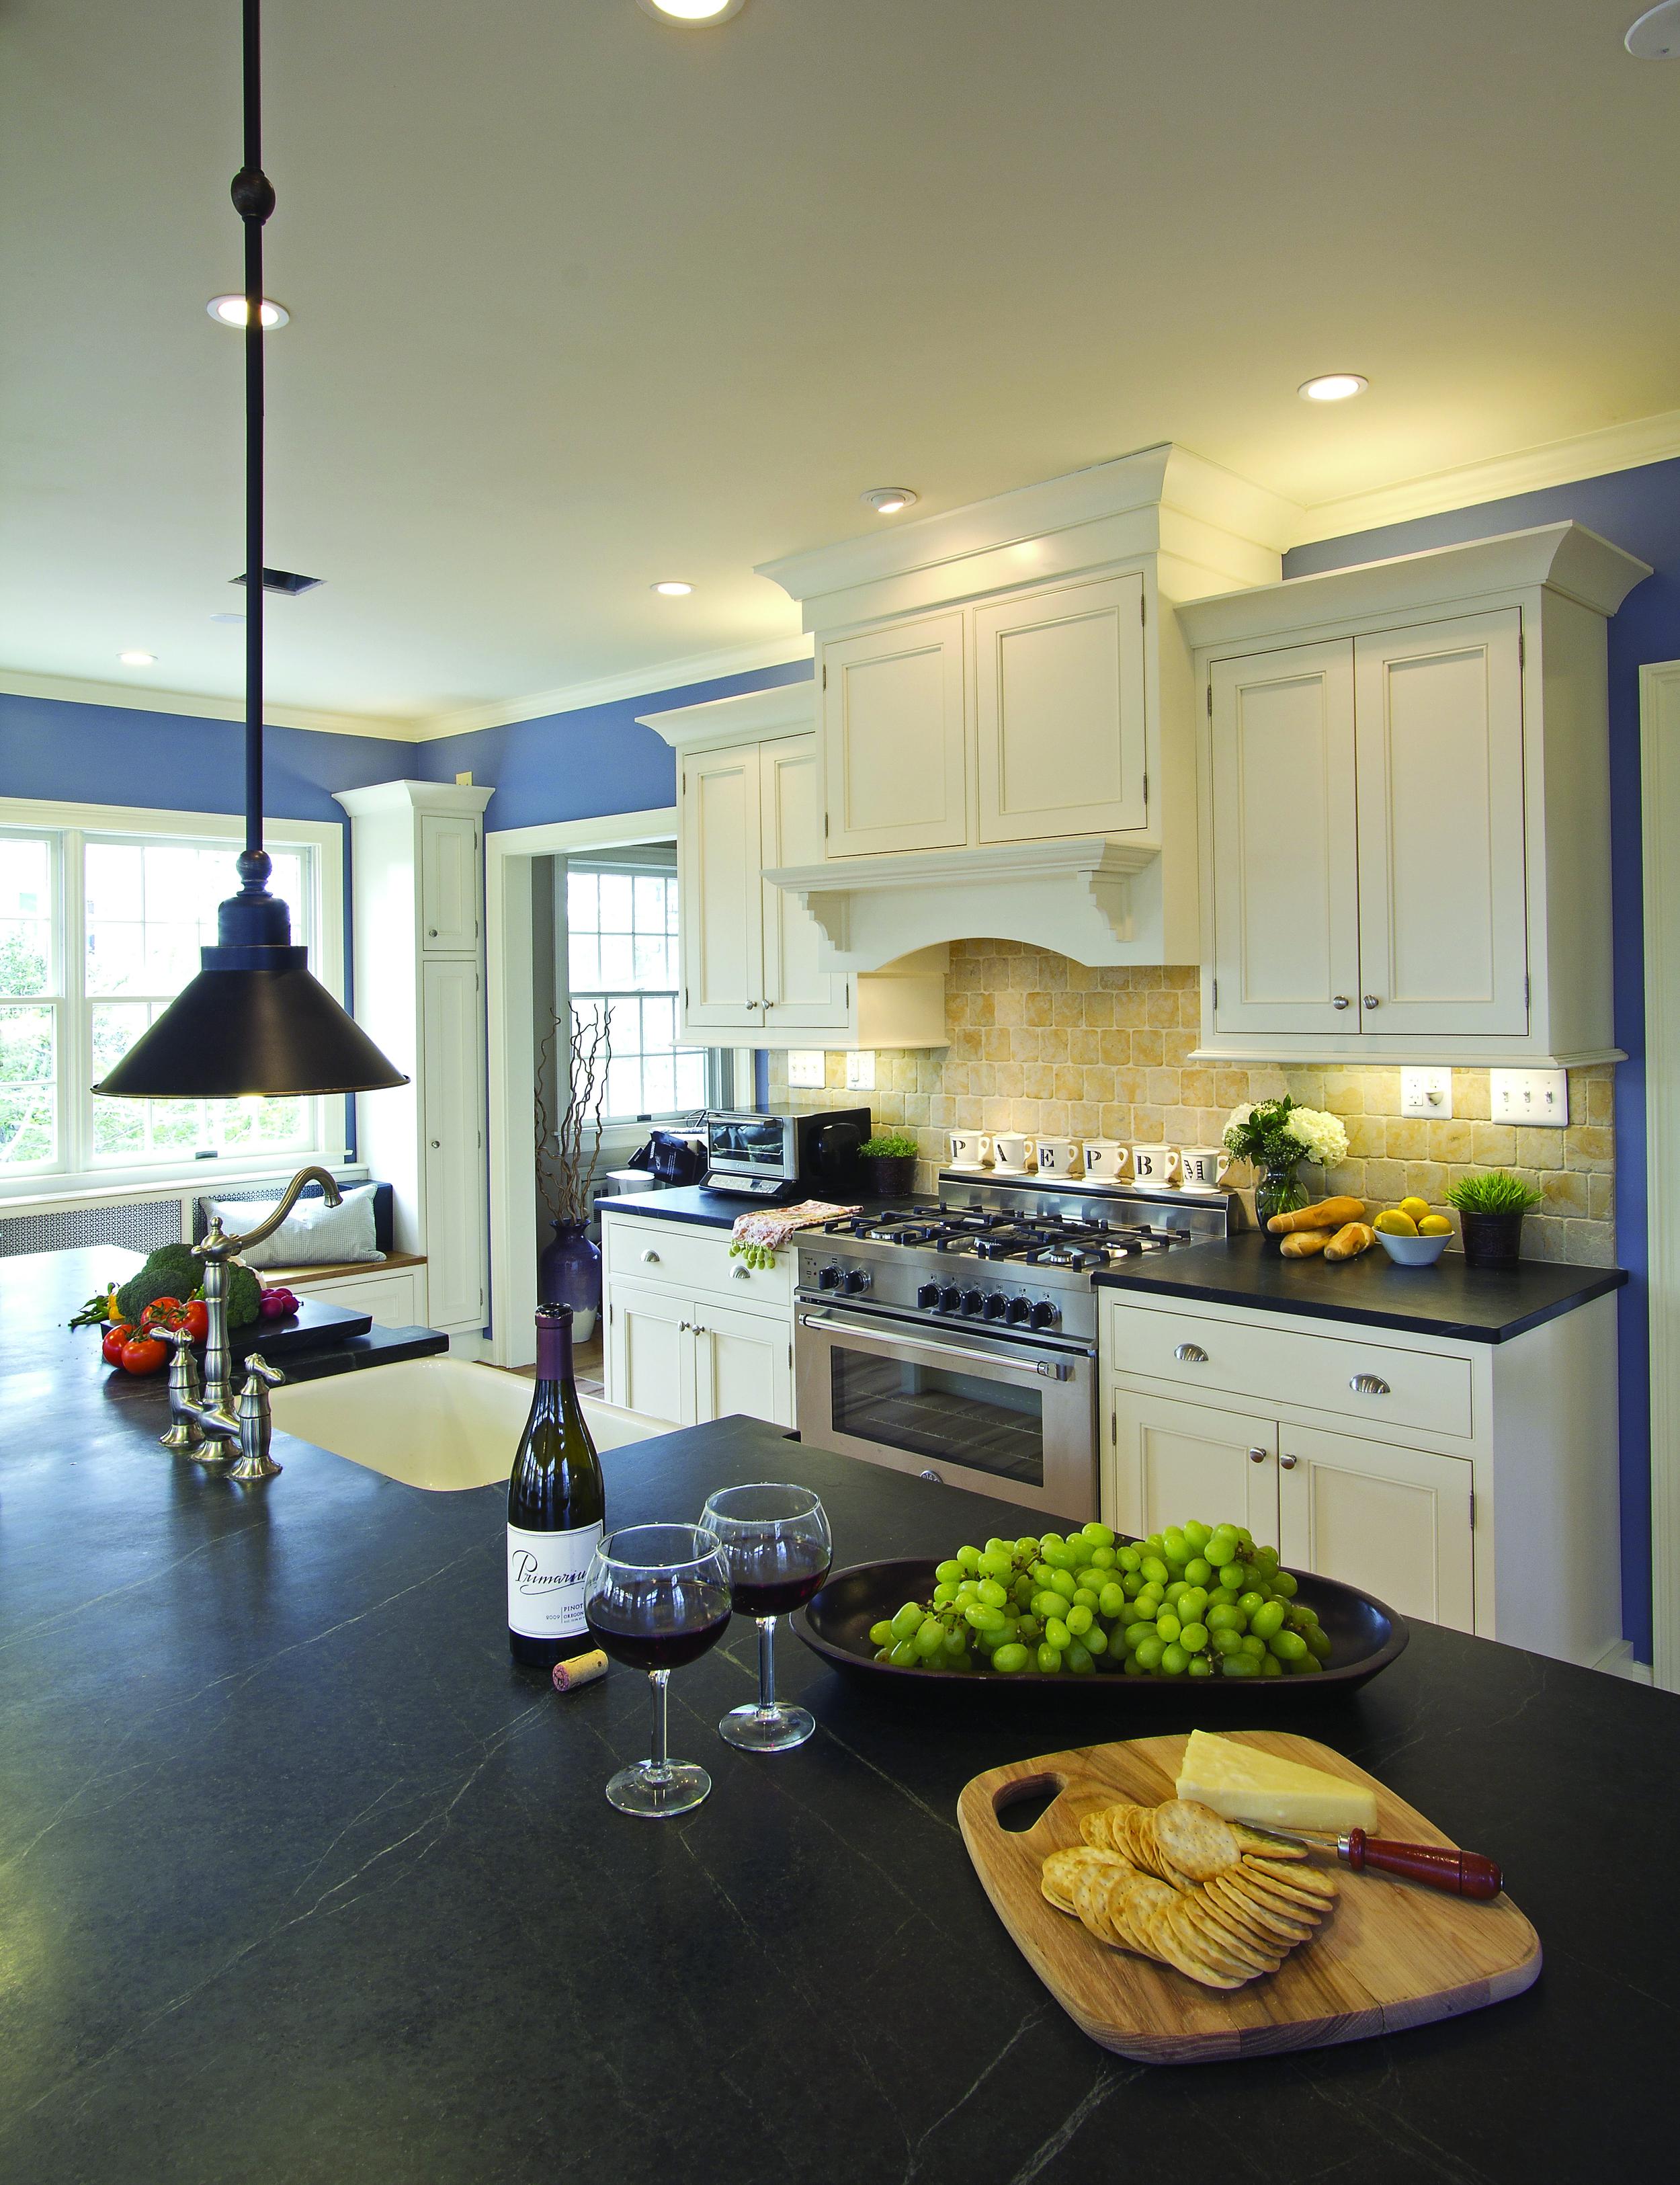 PA Original Soapstone Kitchen